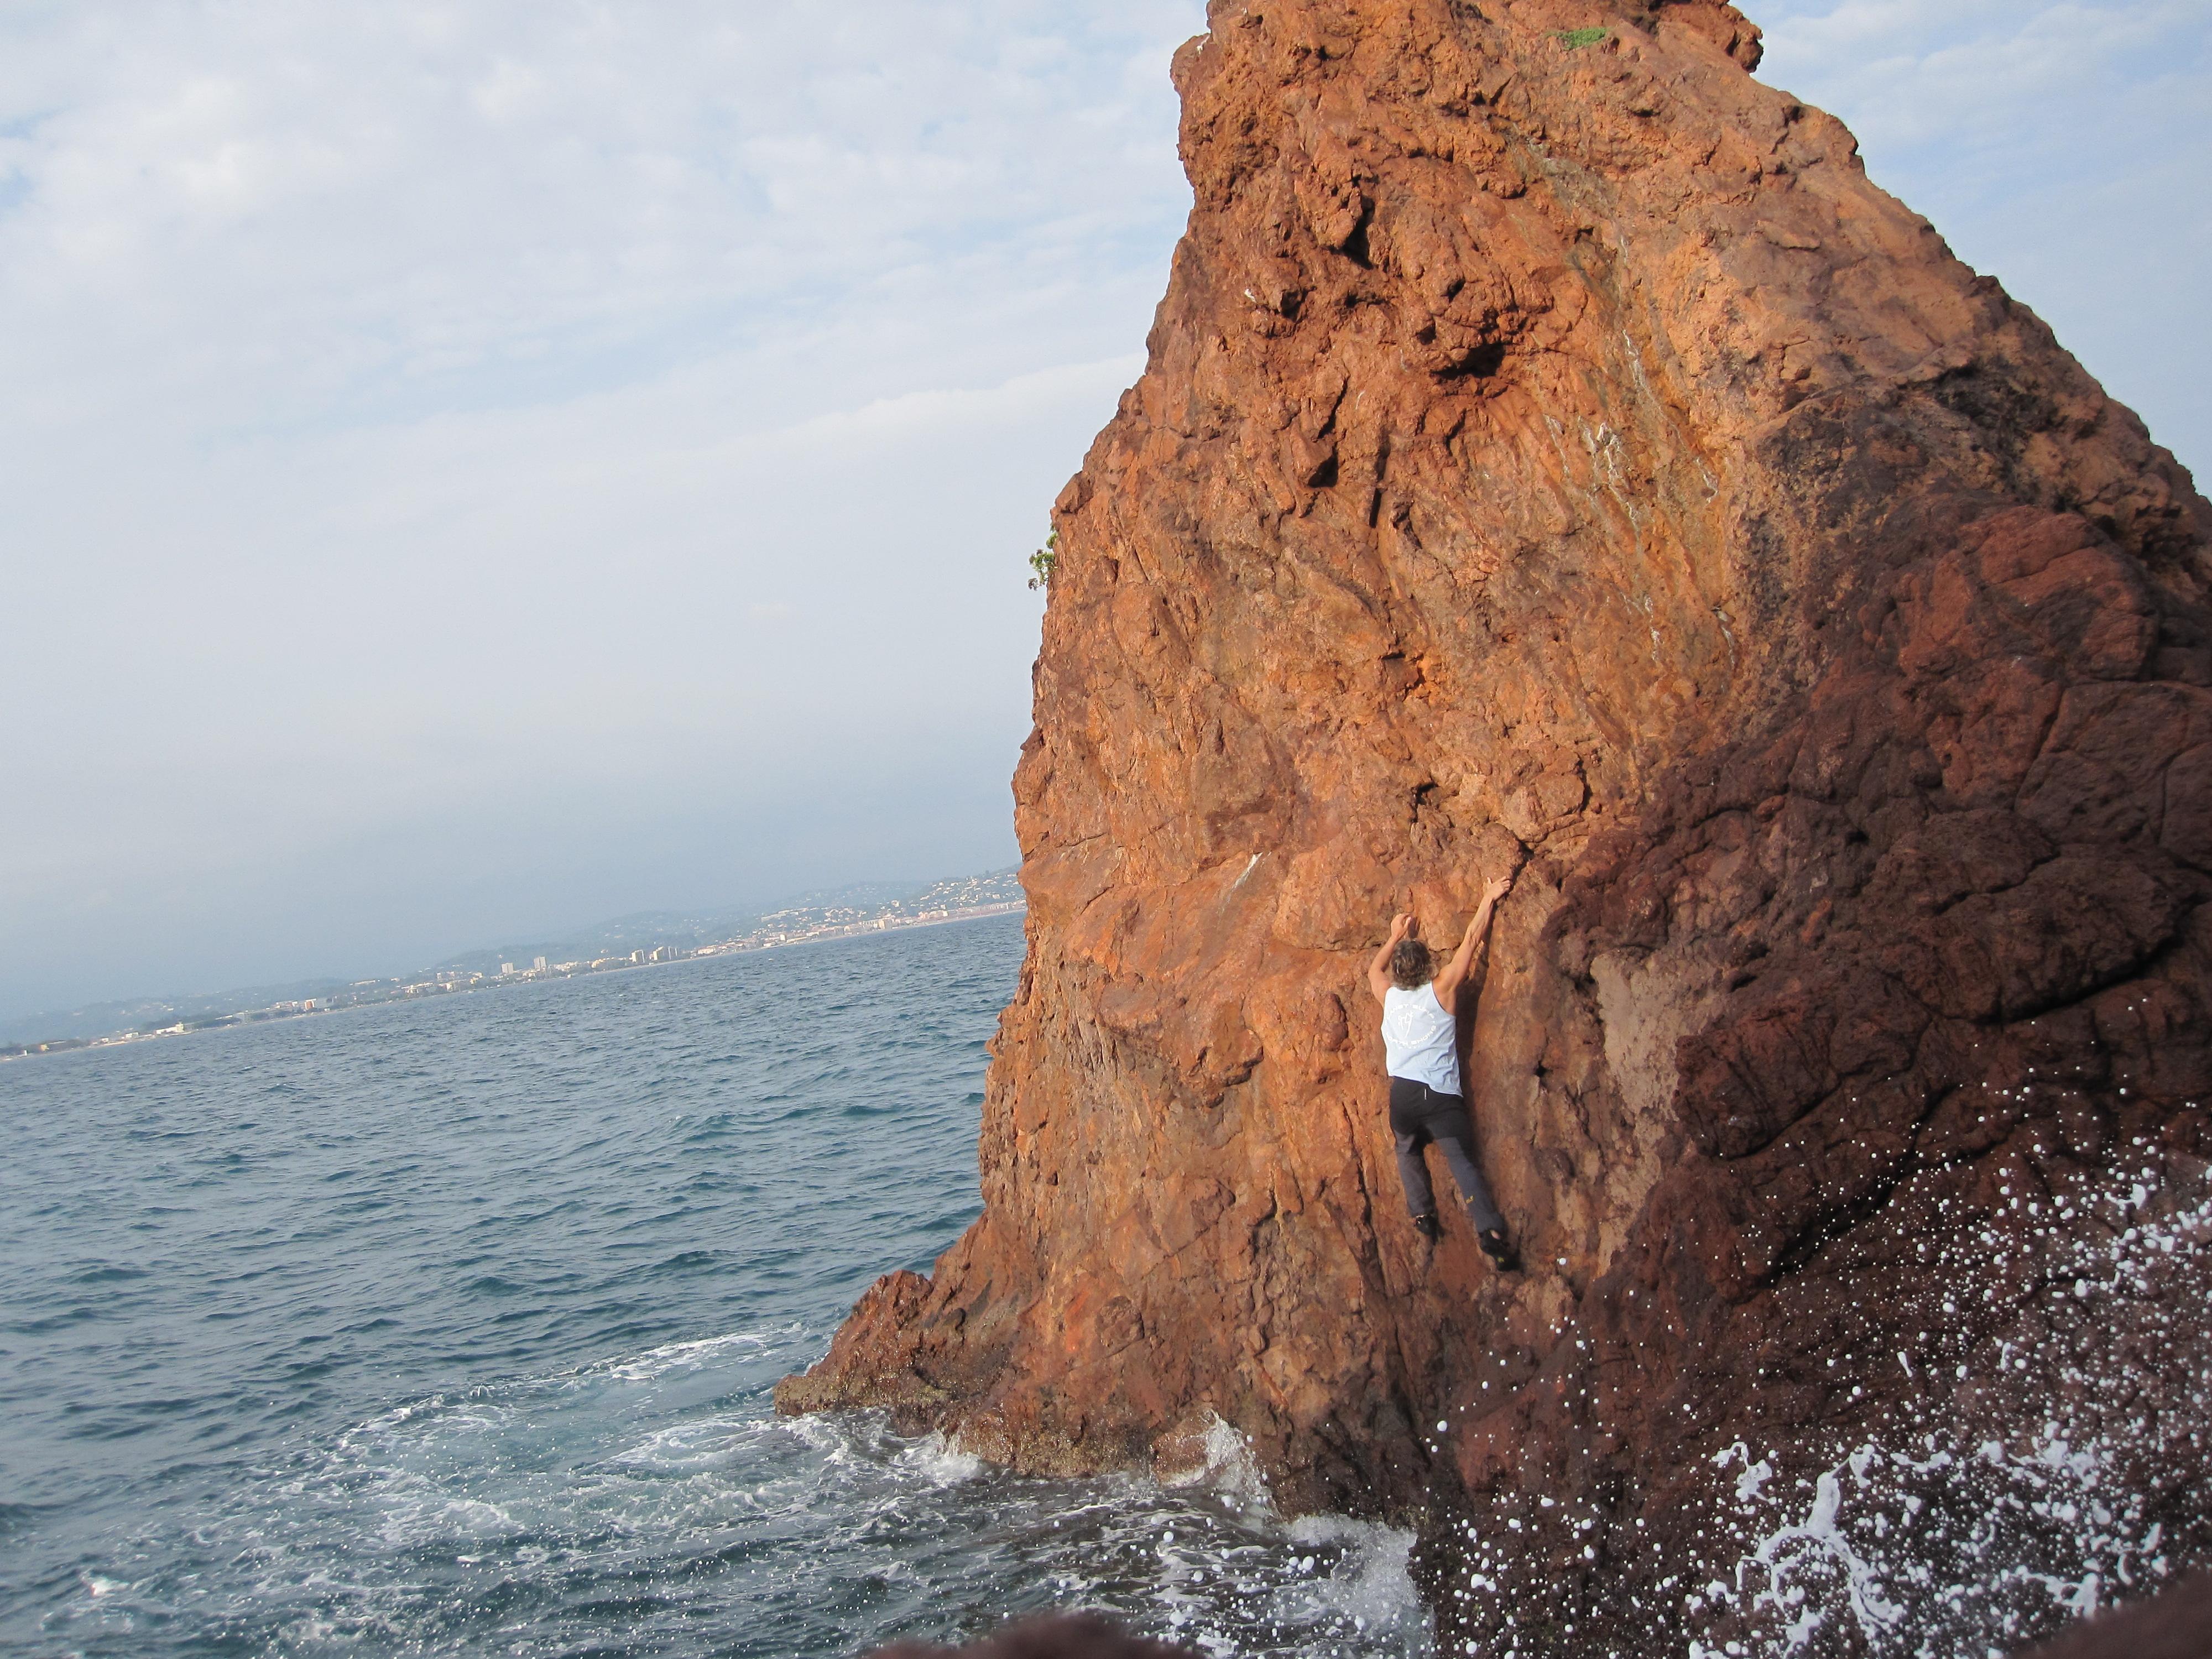 Filedws On Rock At Point D L Aiguillejpg Wikimedia